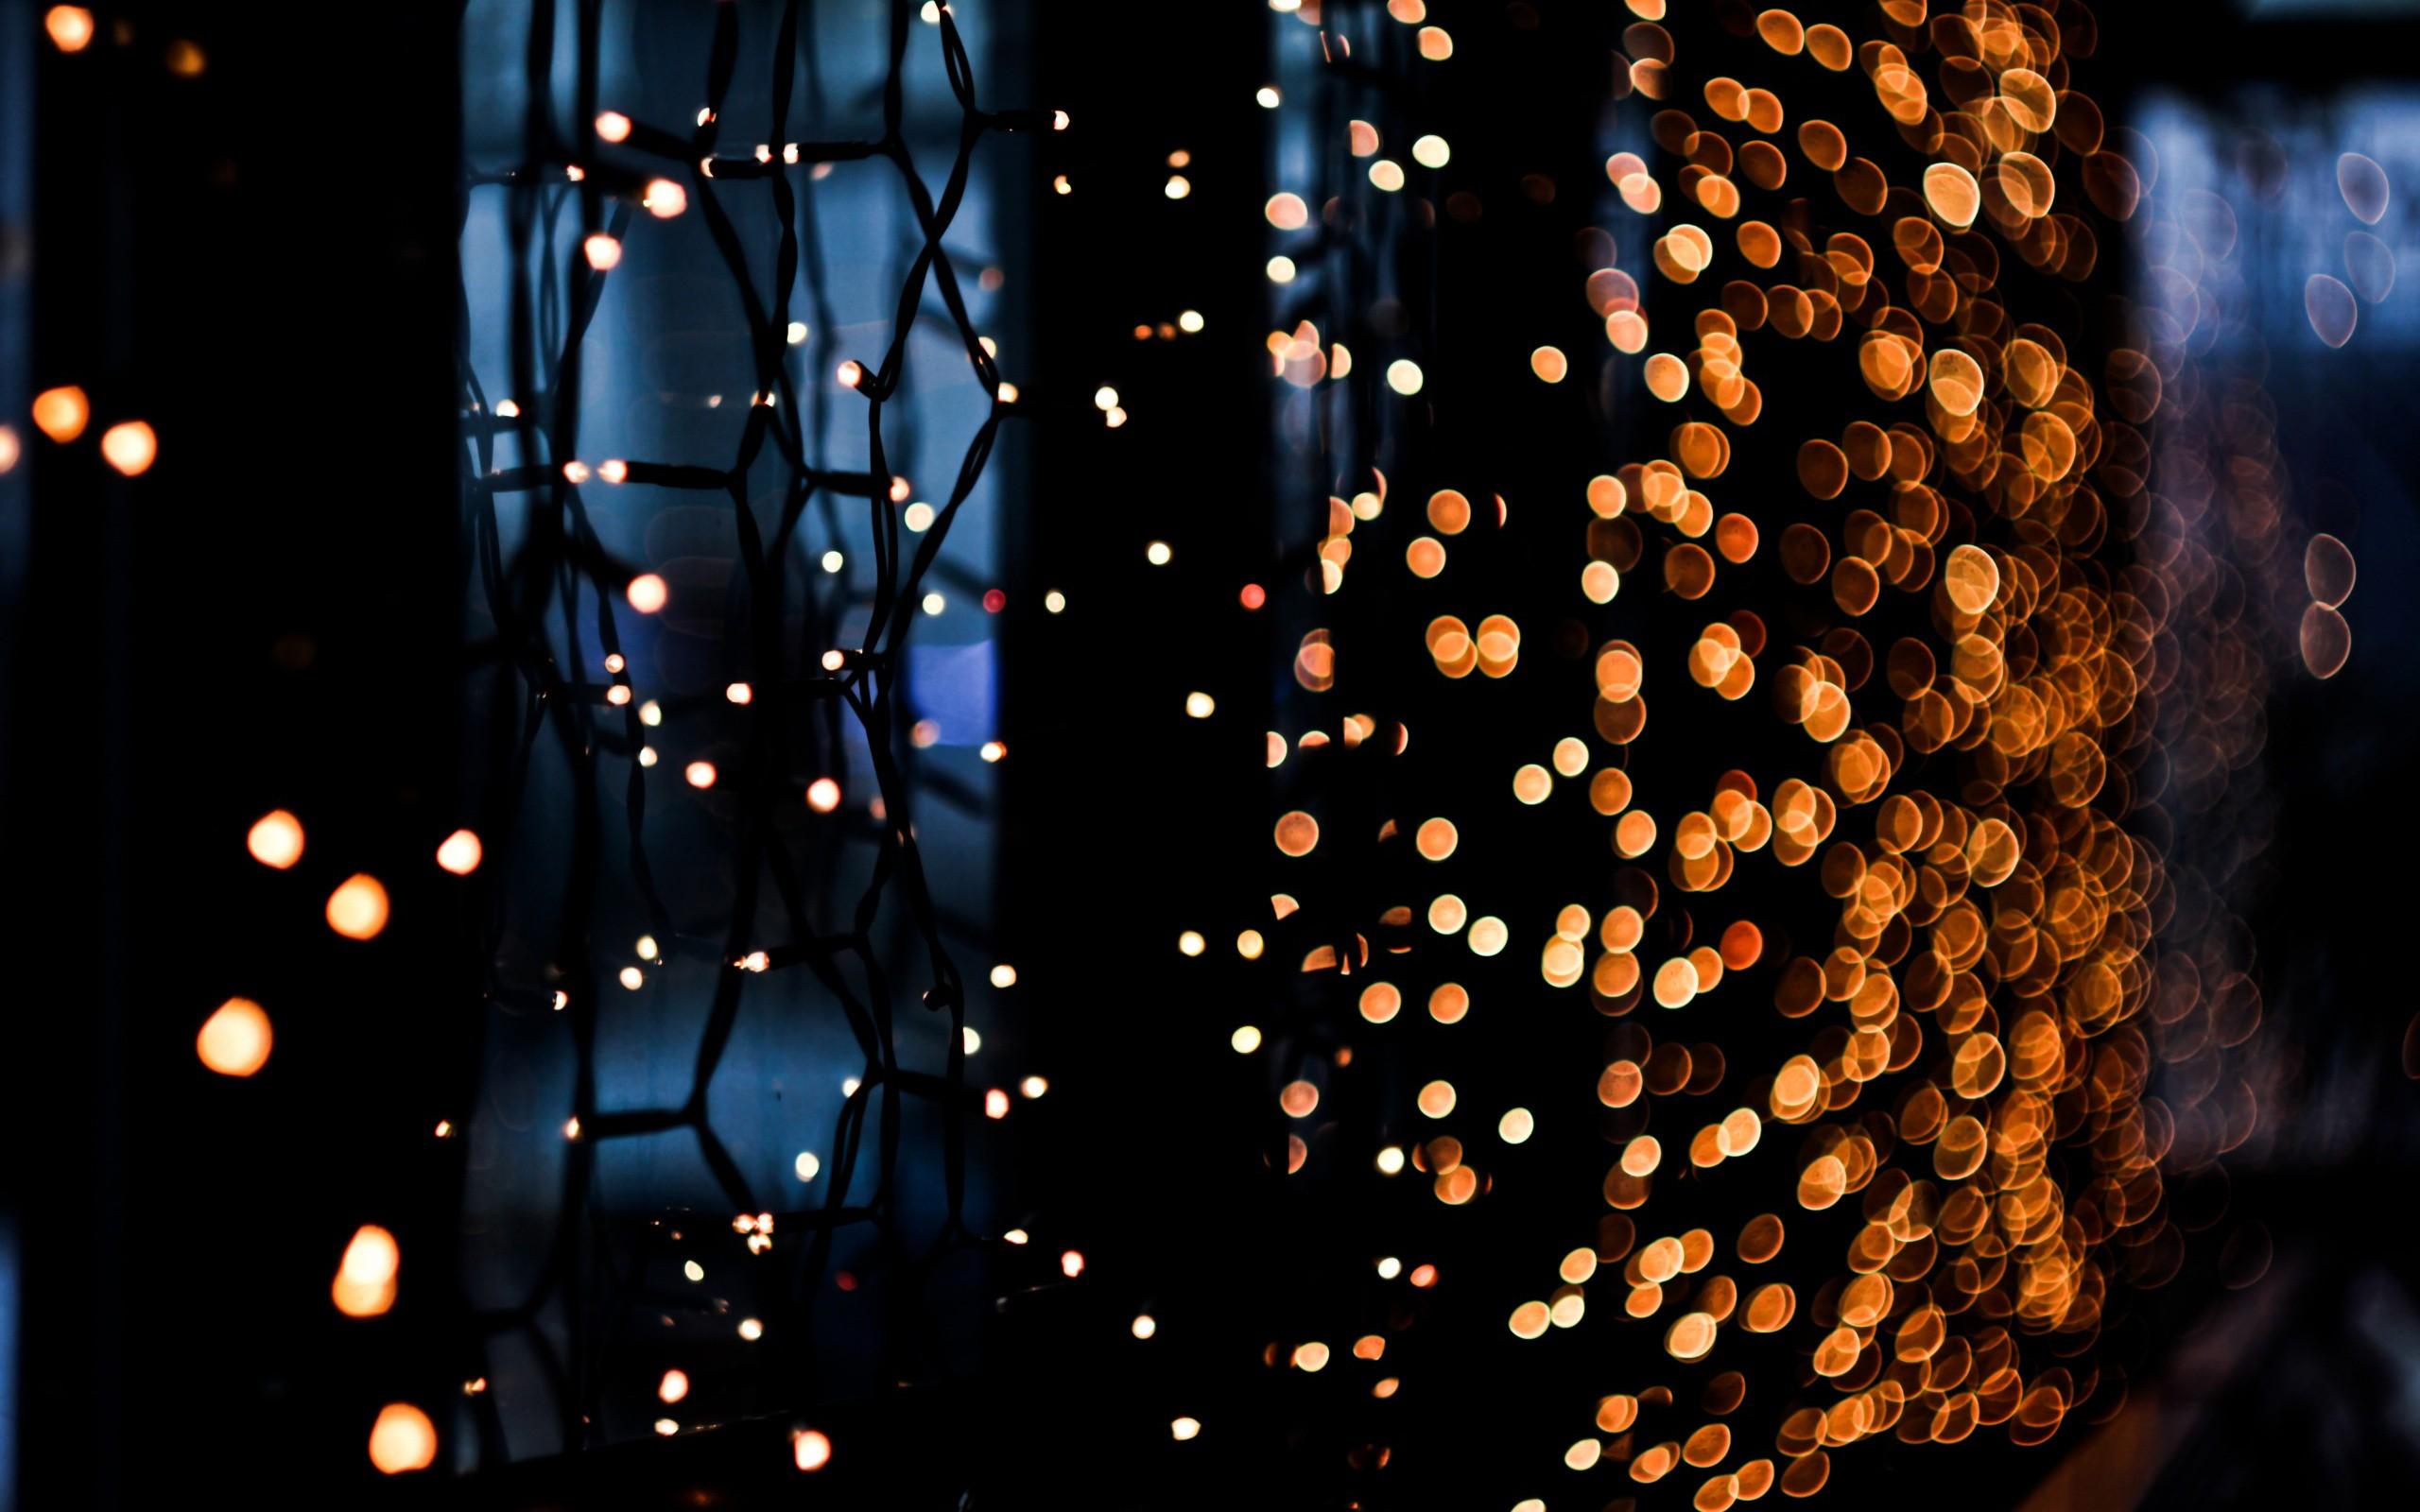 Night lights artistic bokeh wallpaper 2560x1600 10027 2560x1600